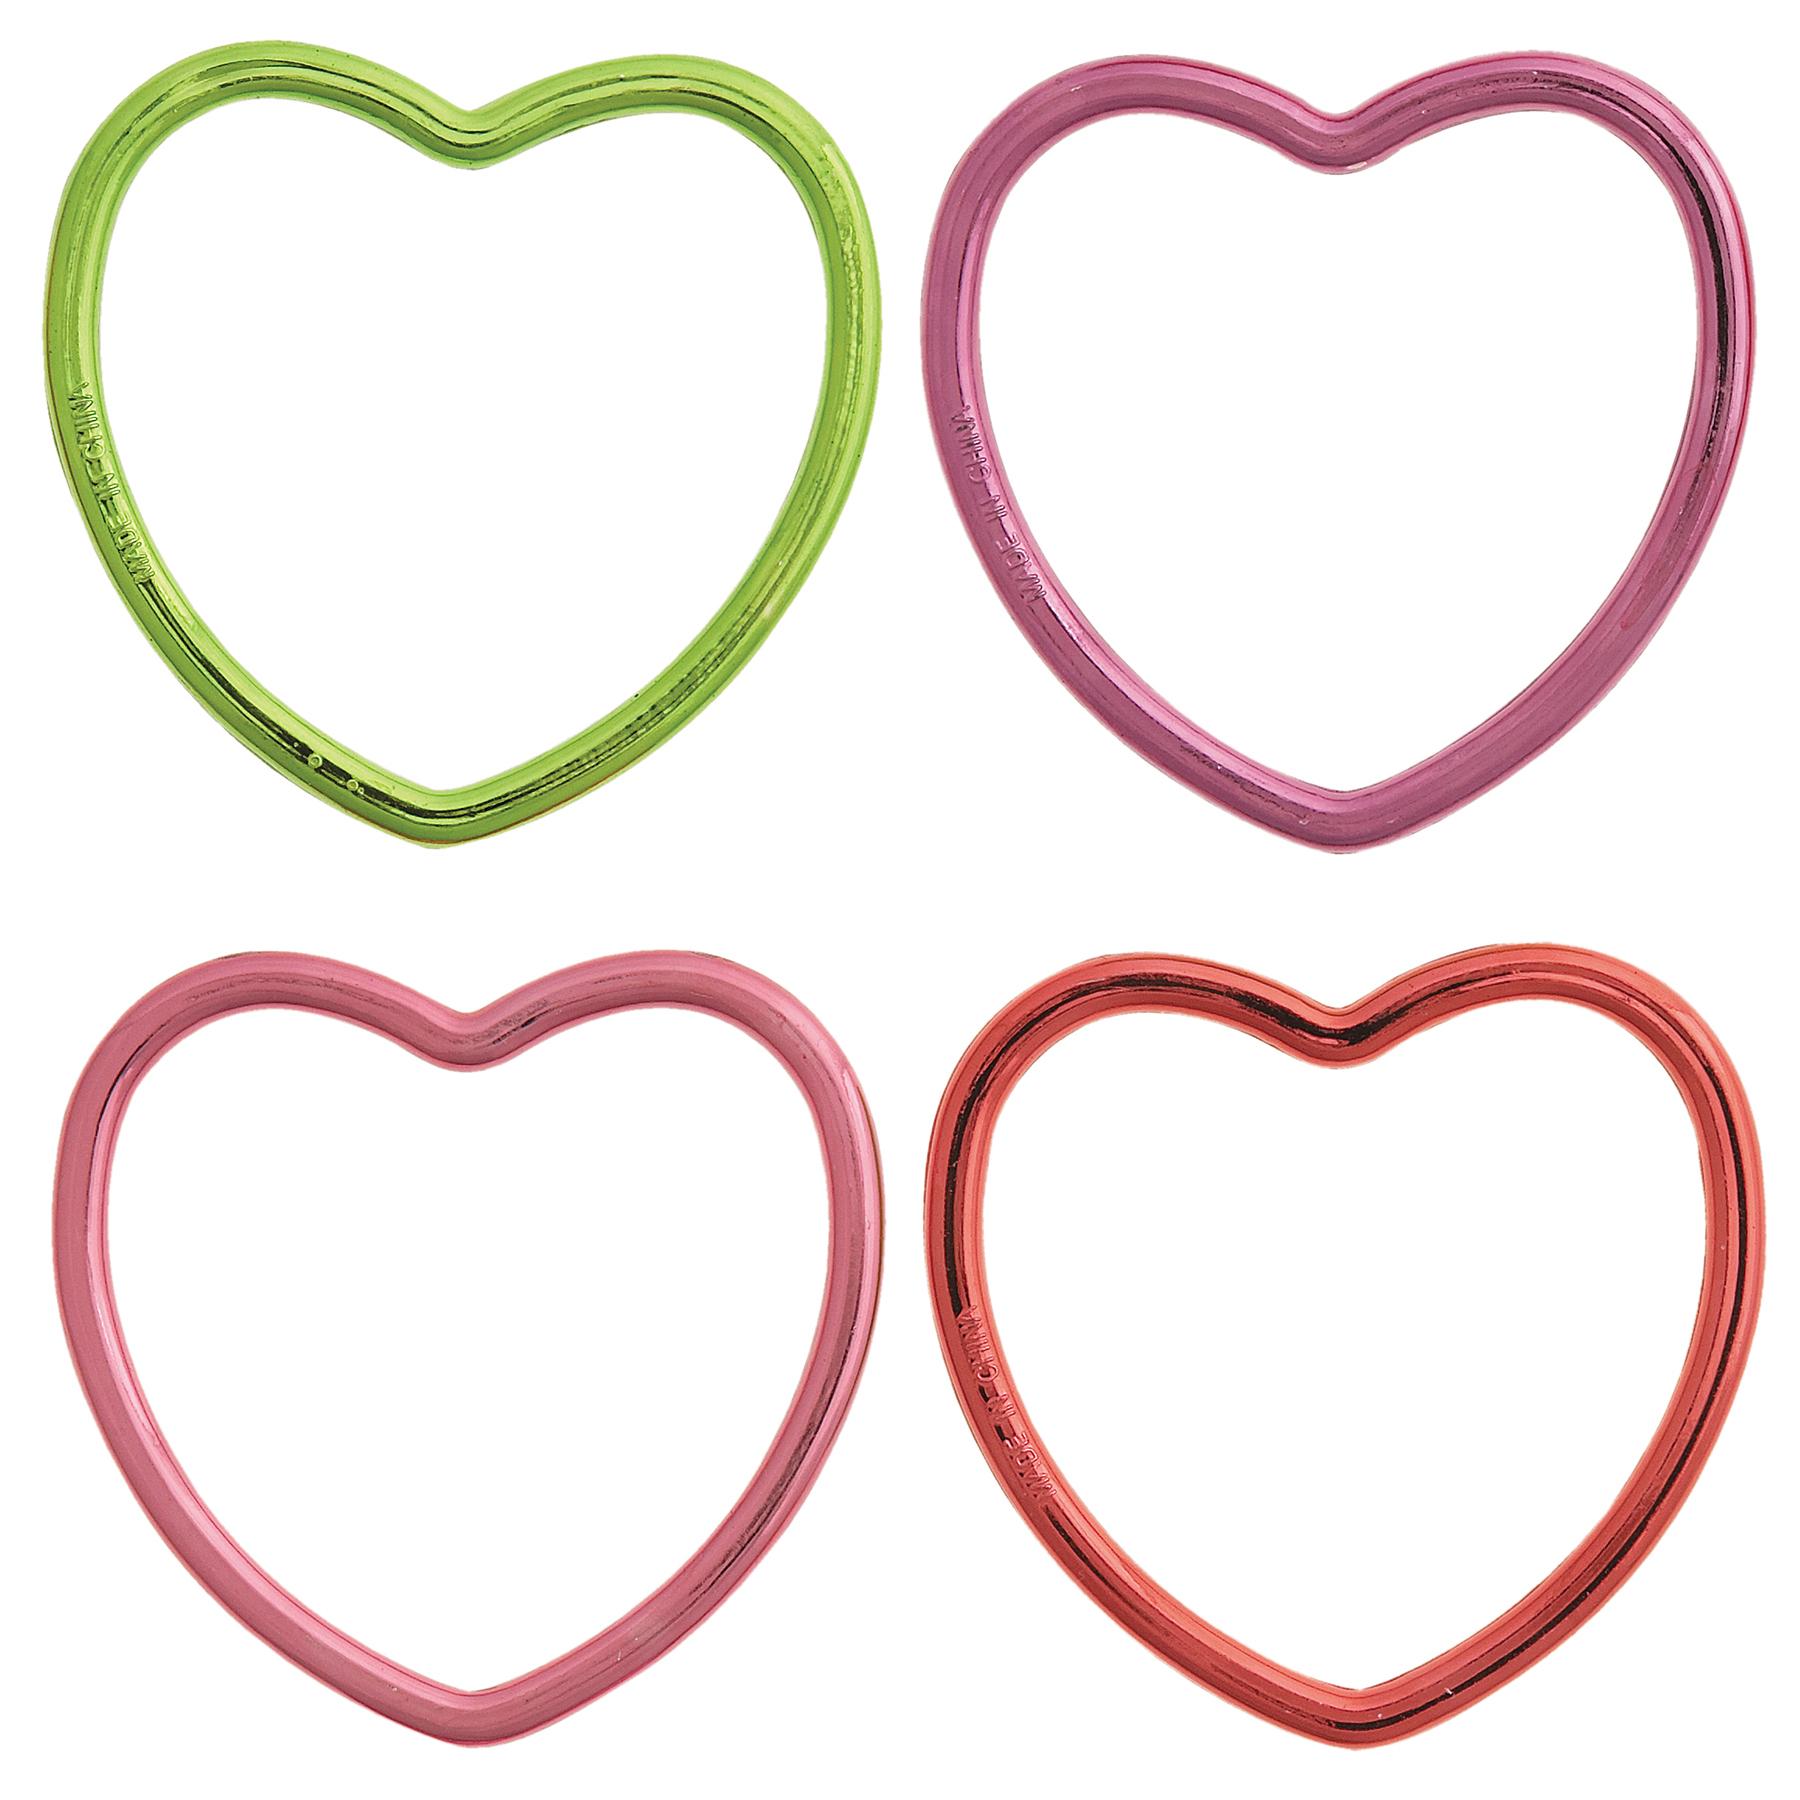 1800x1800 Plastic Metallic Heart Bracelet Favors Girl Birthday Party Favors